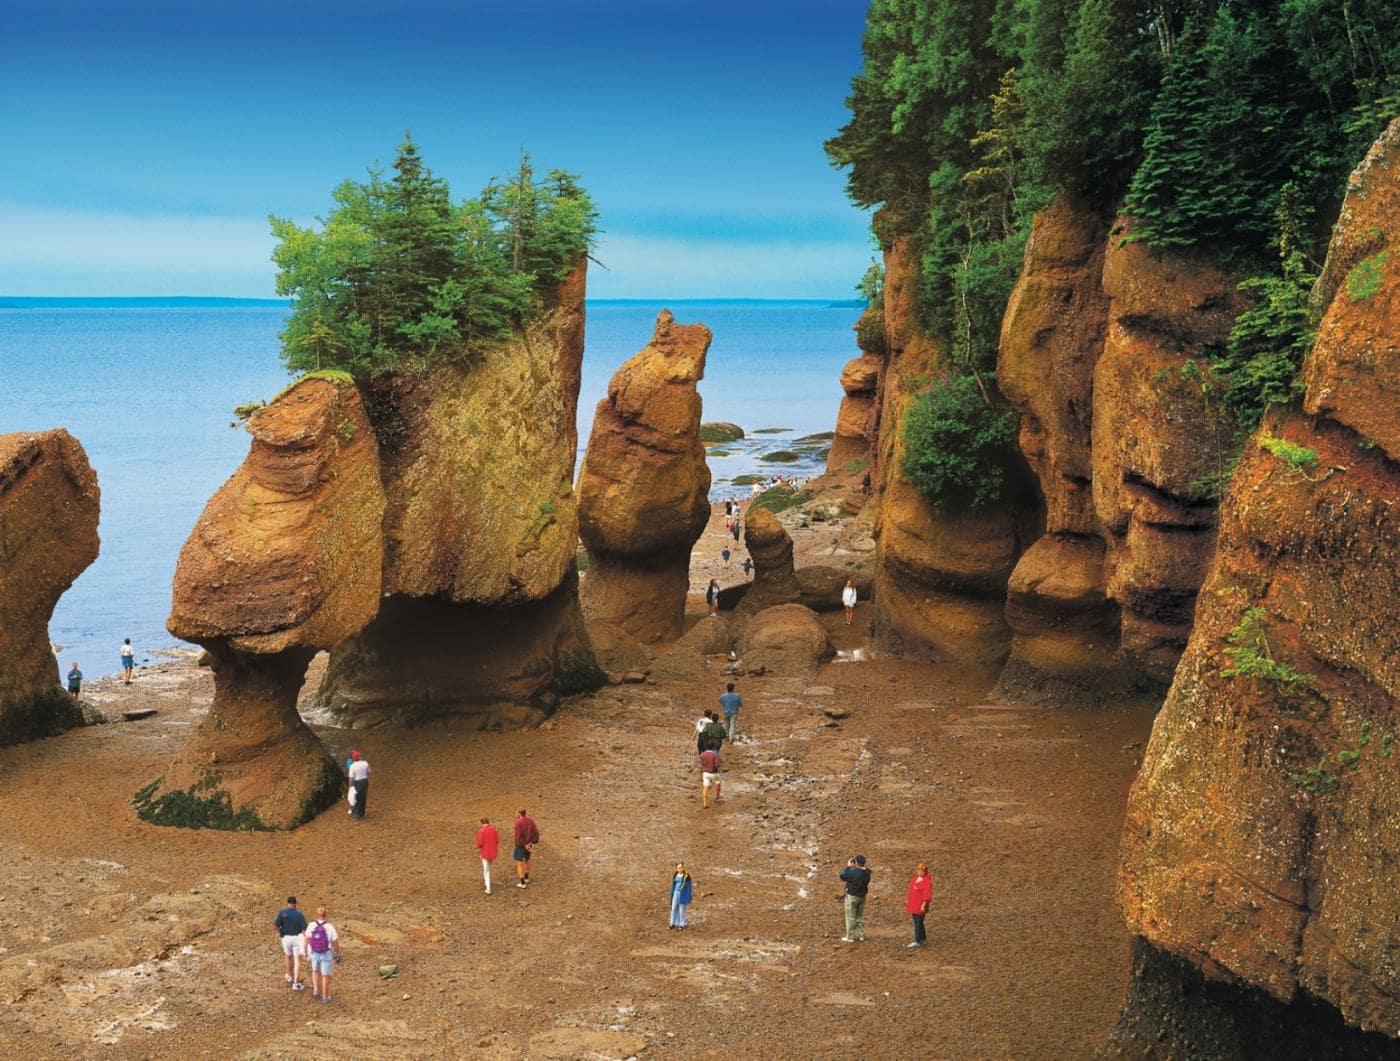 hopewell-rocks-tidal-discovery-saint-john-nb-canada-1.jpg